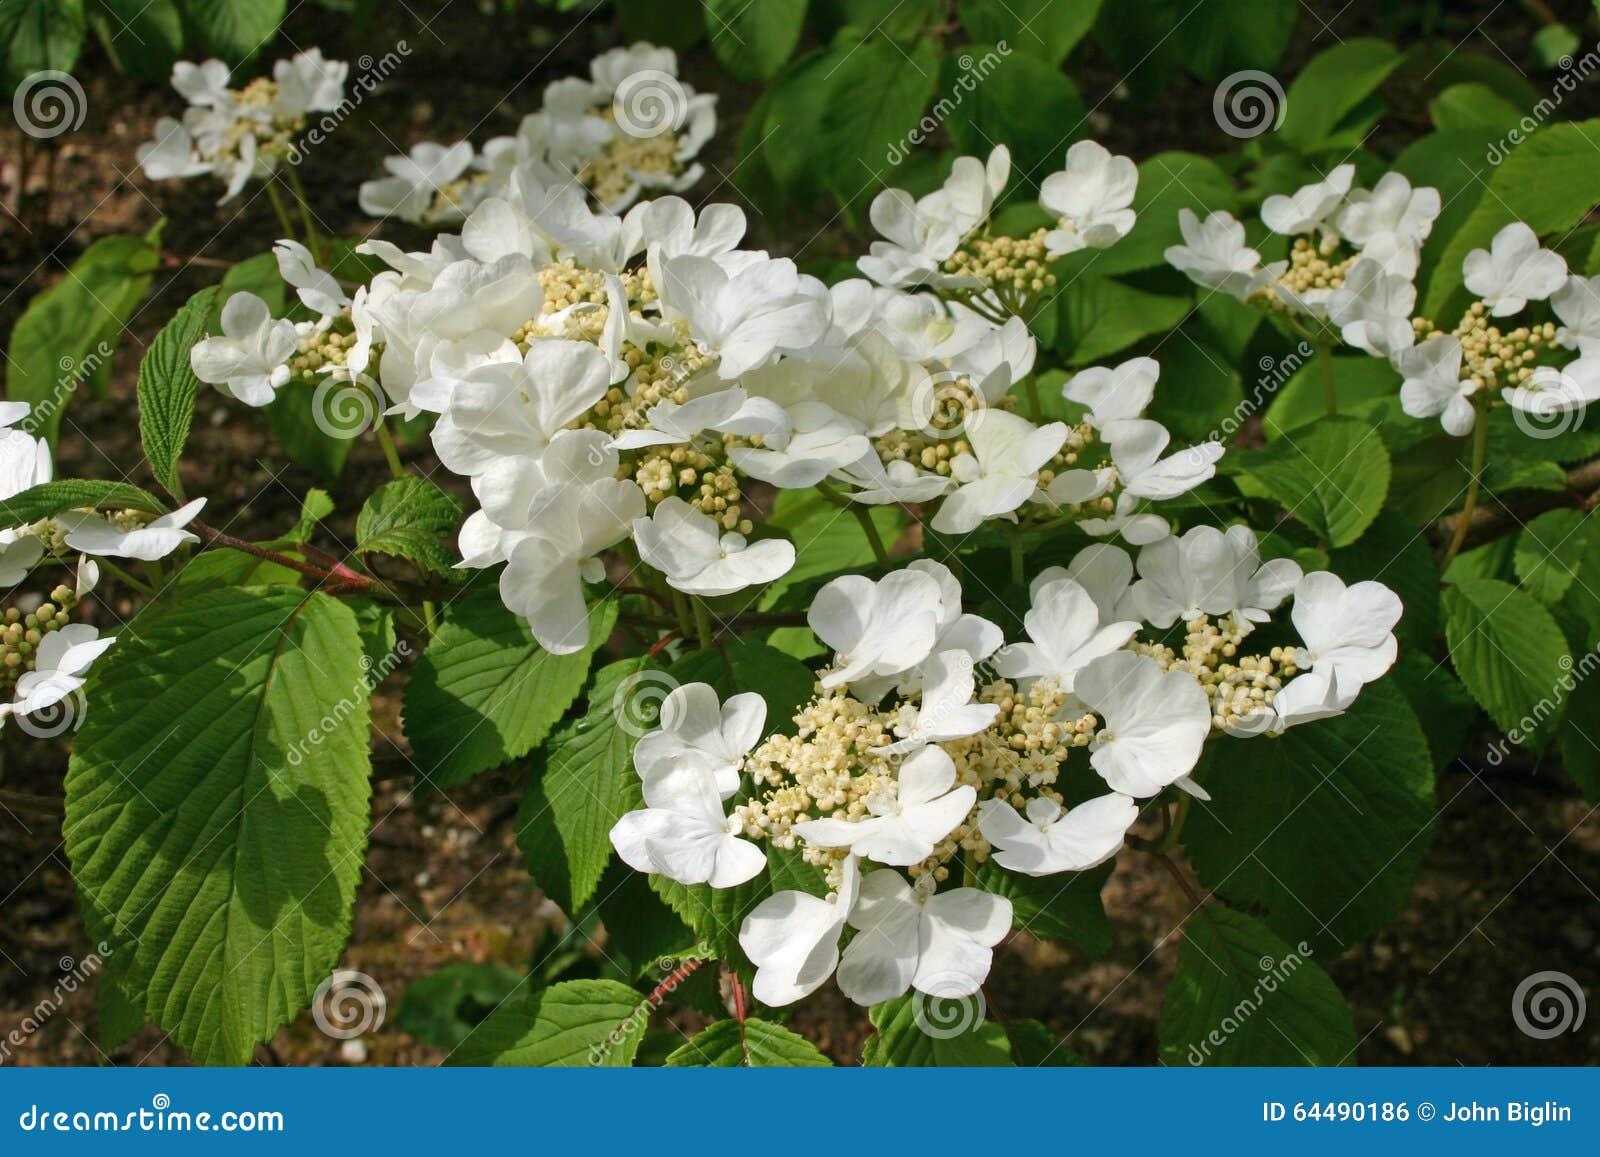 White Lacecap Hydrangea Flowers Stock Photo Image Of Garden